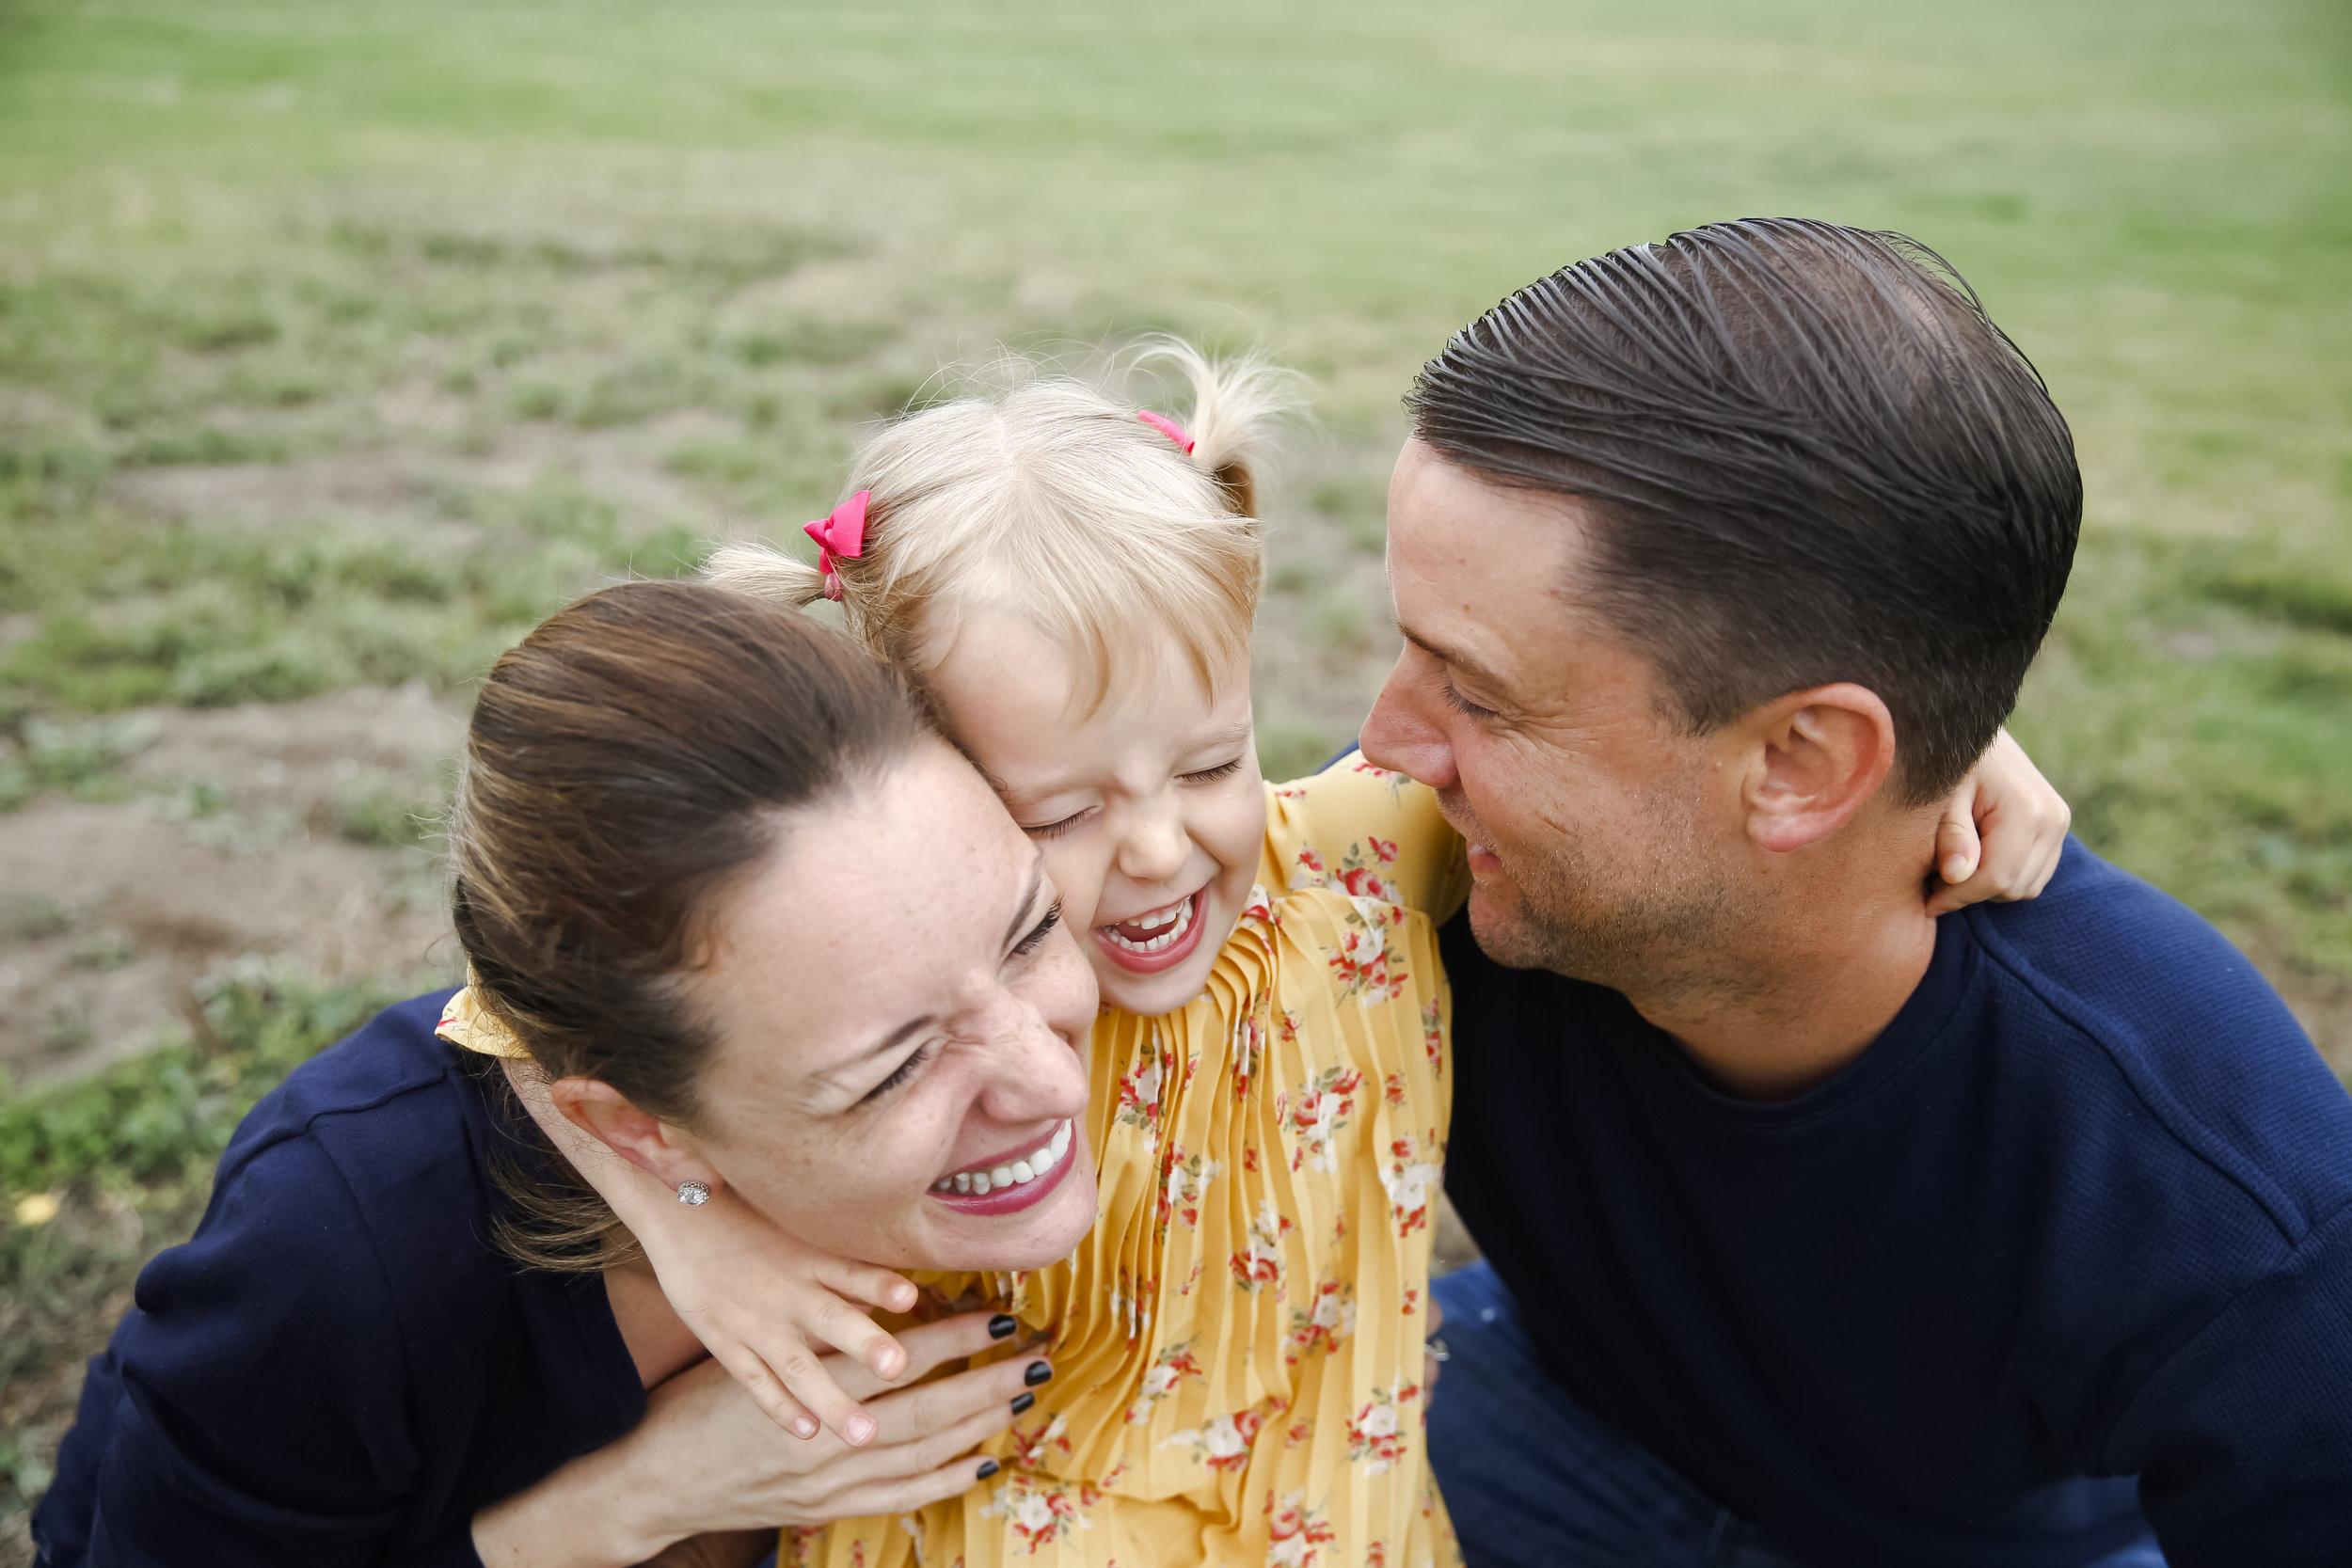 curranfamilyminis-ahp-00025.jpg